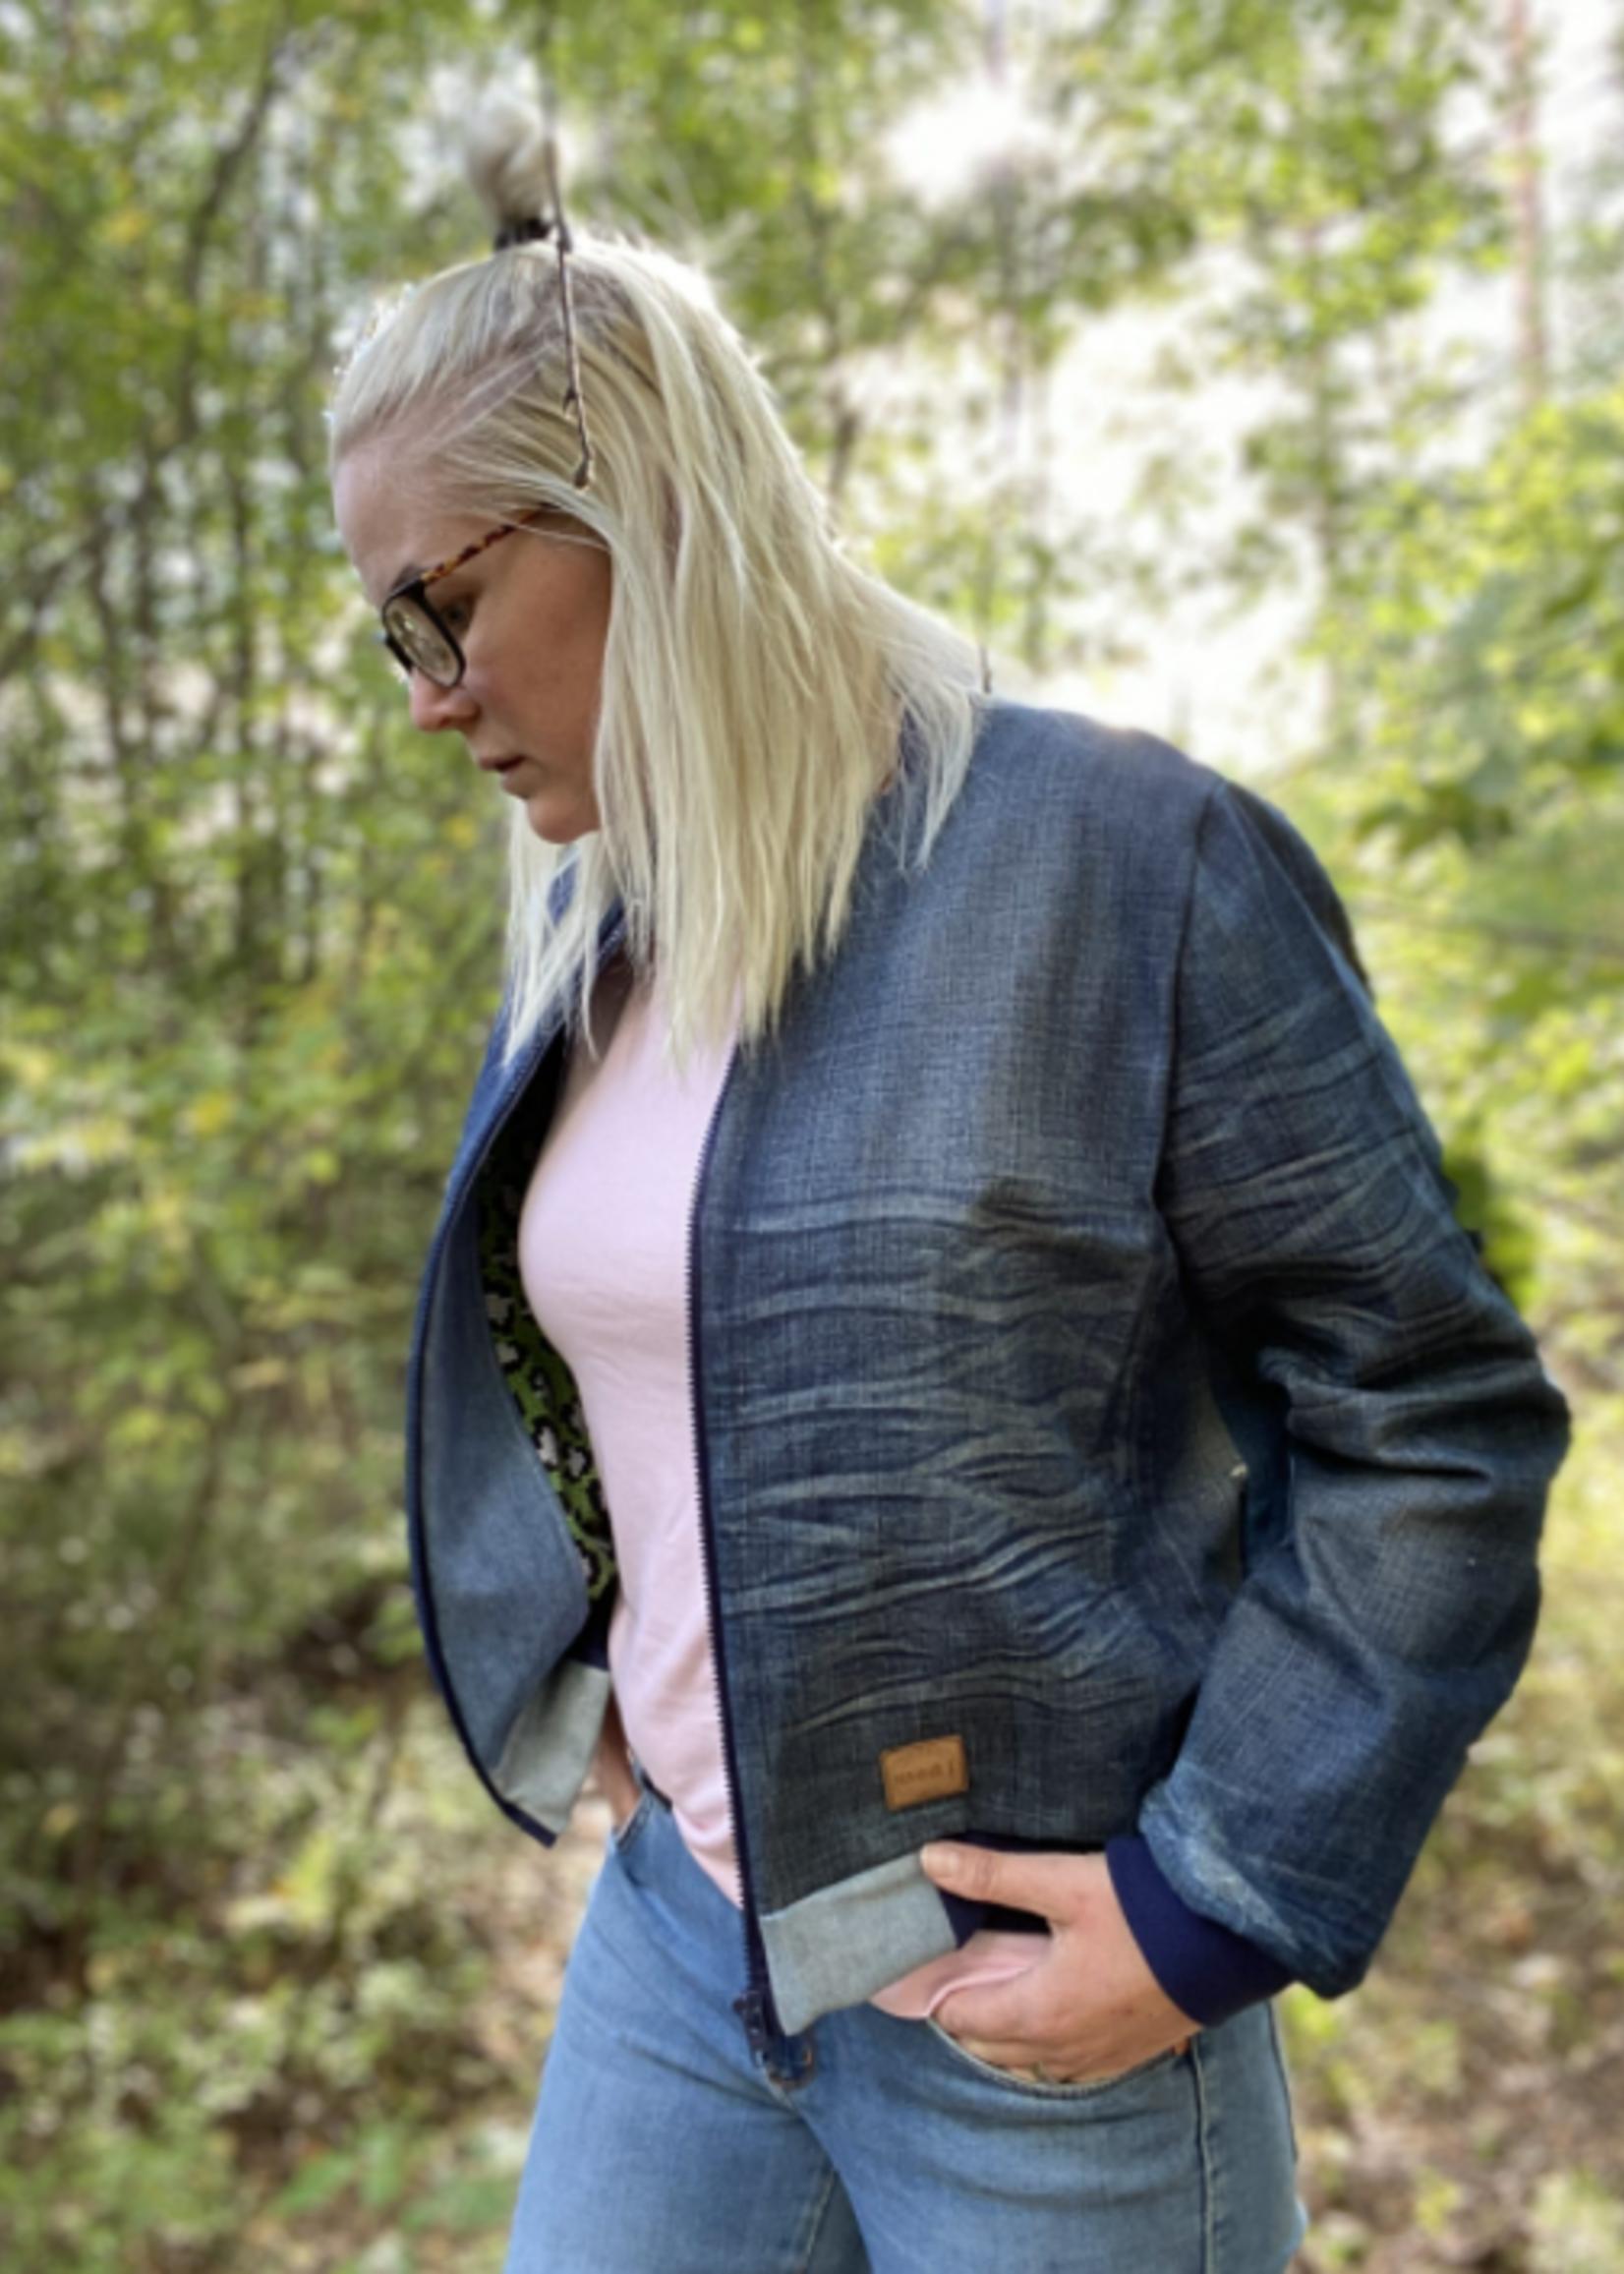 Bel'Etoile Clea bomberjas voor dames & tieners – naaipatroon